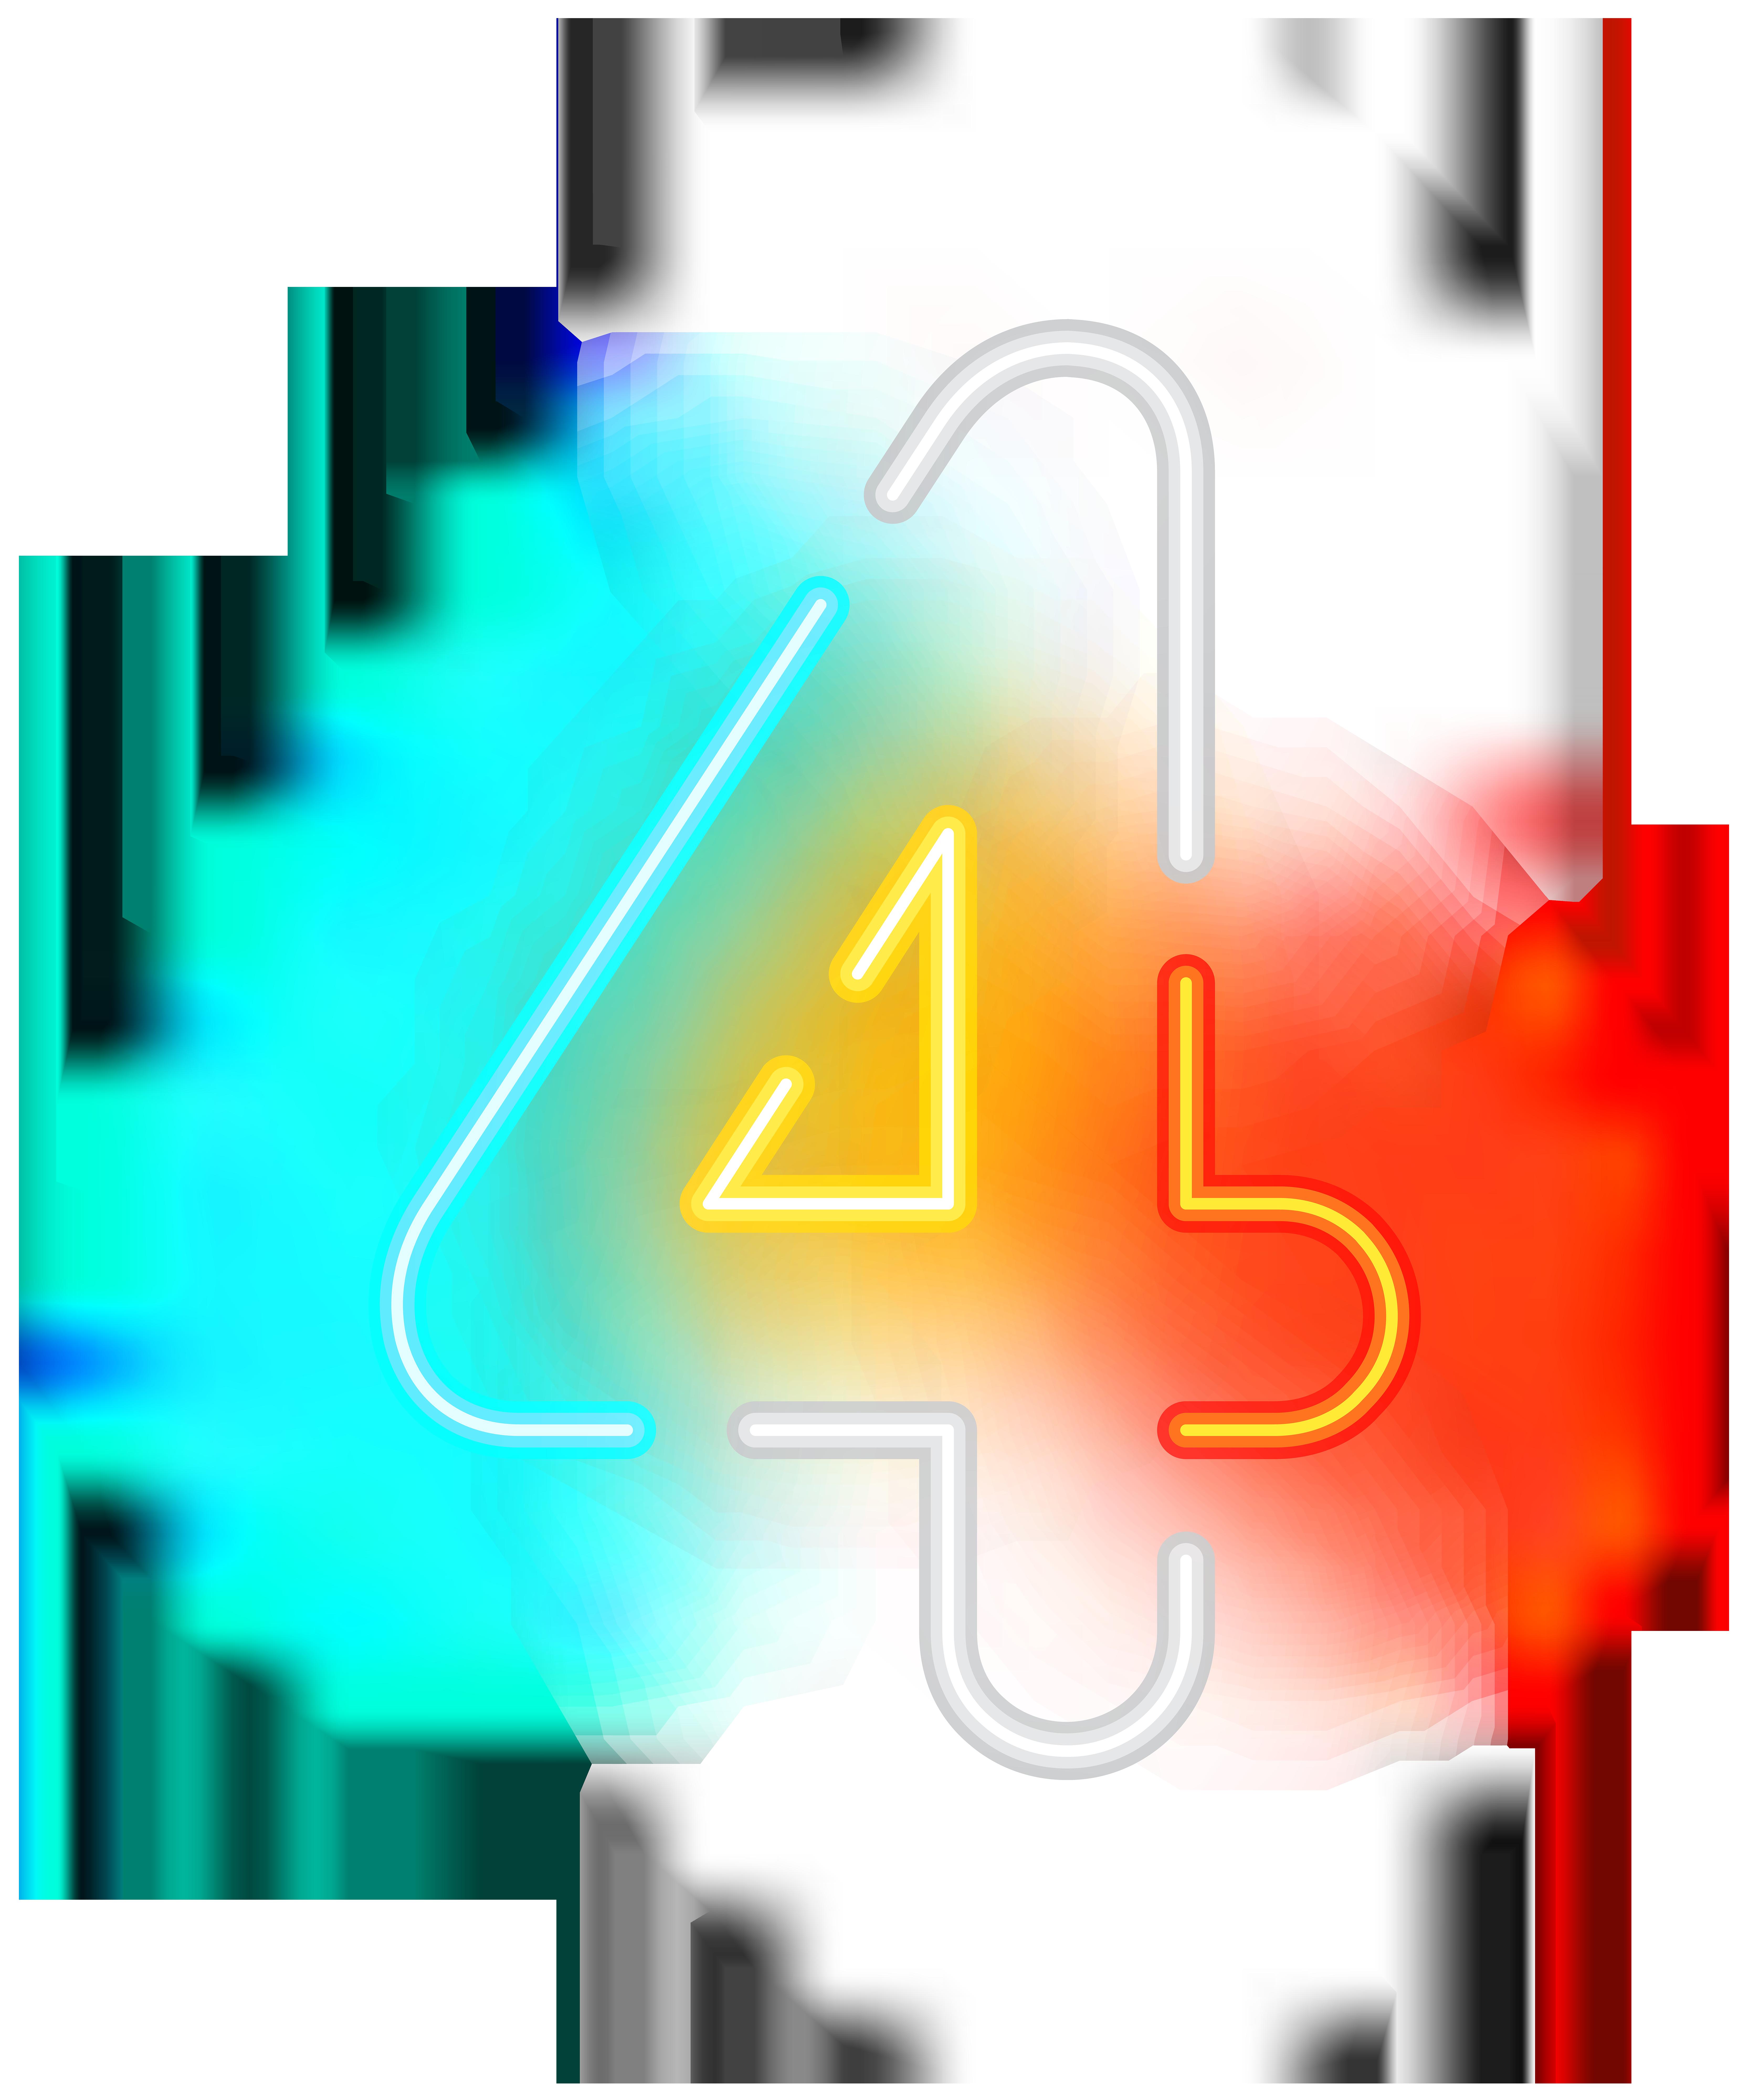 6664x8000 Number Four Neon Transparent Clip Art Imageu200b Gallery